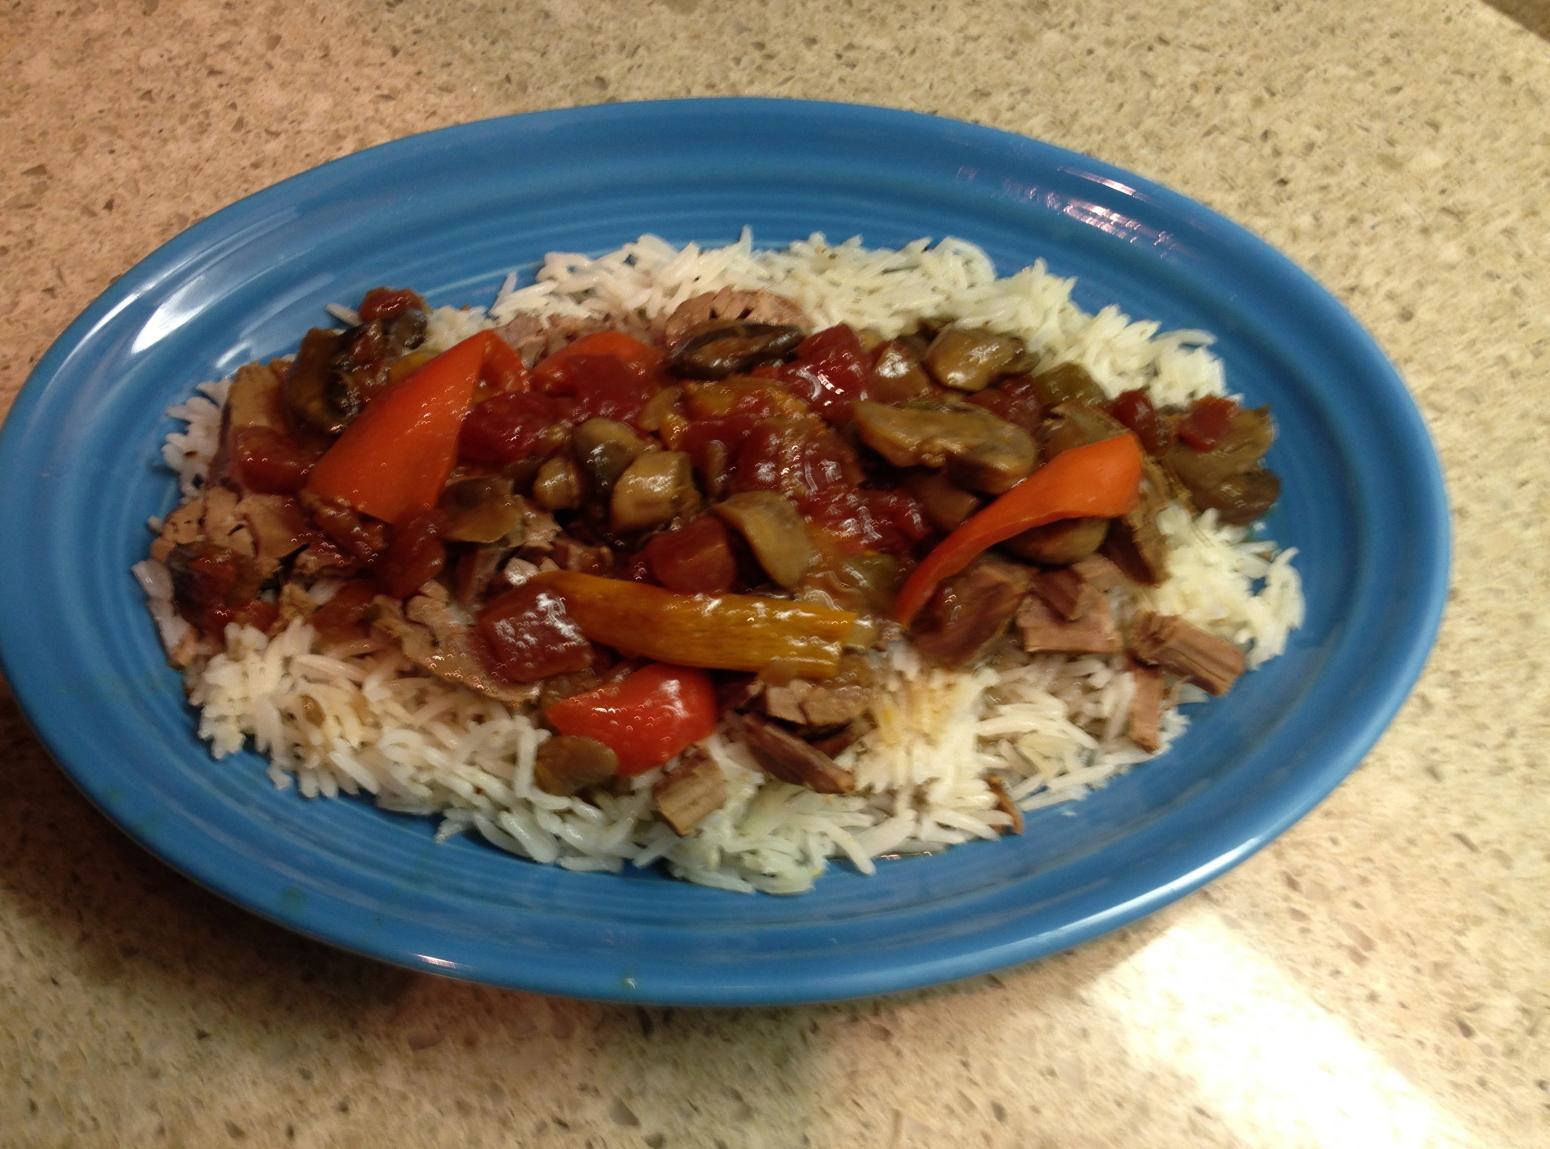 Southwestern Pot Roast Recipe | Just A Pinch Recipes